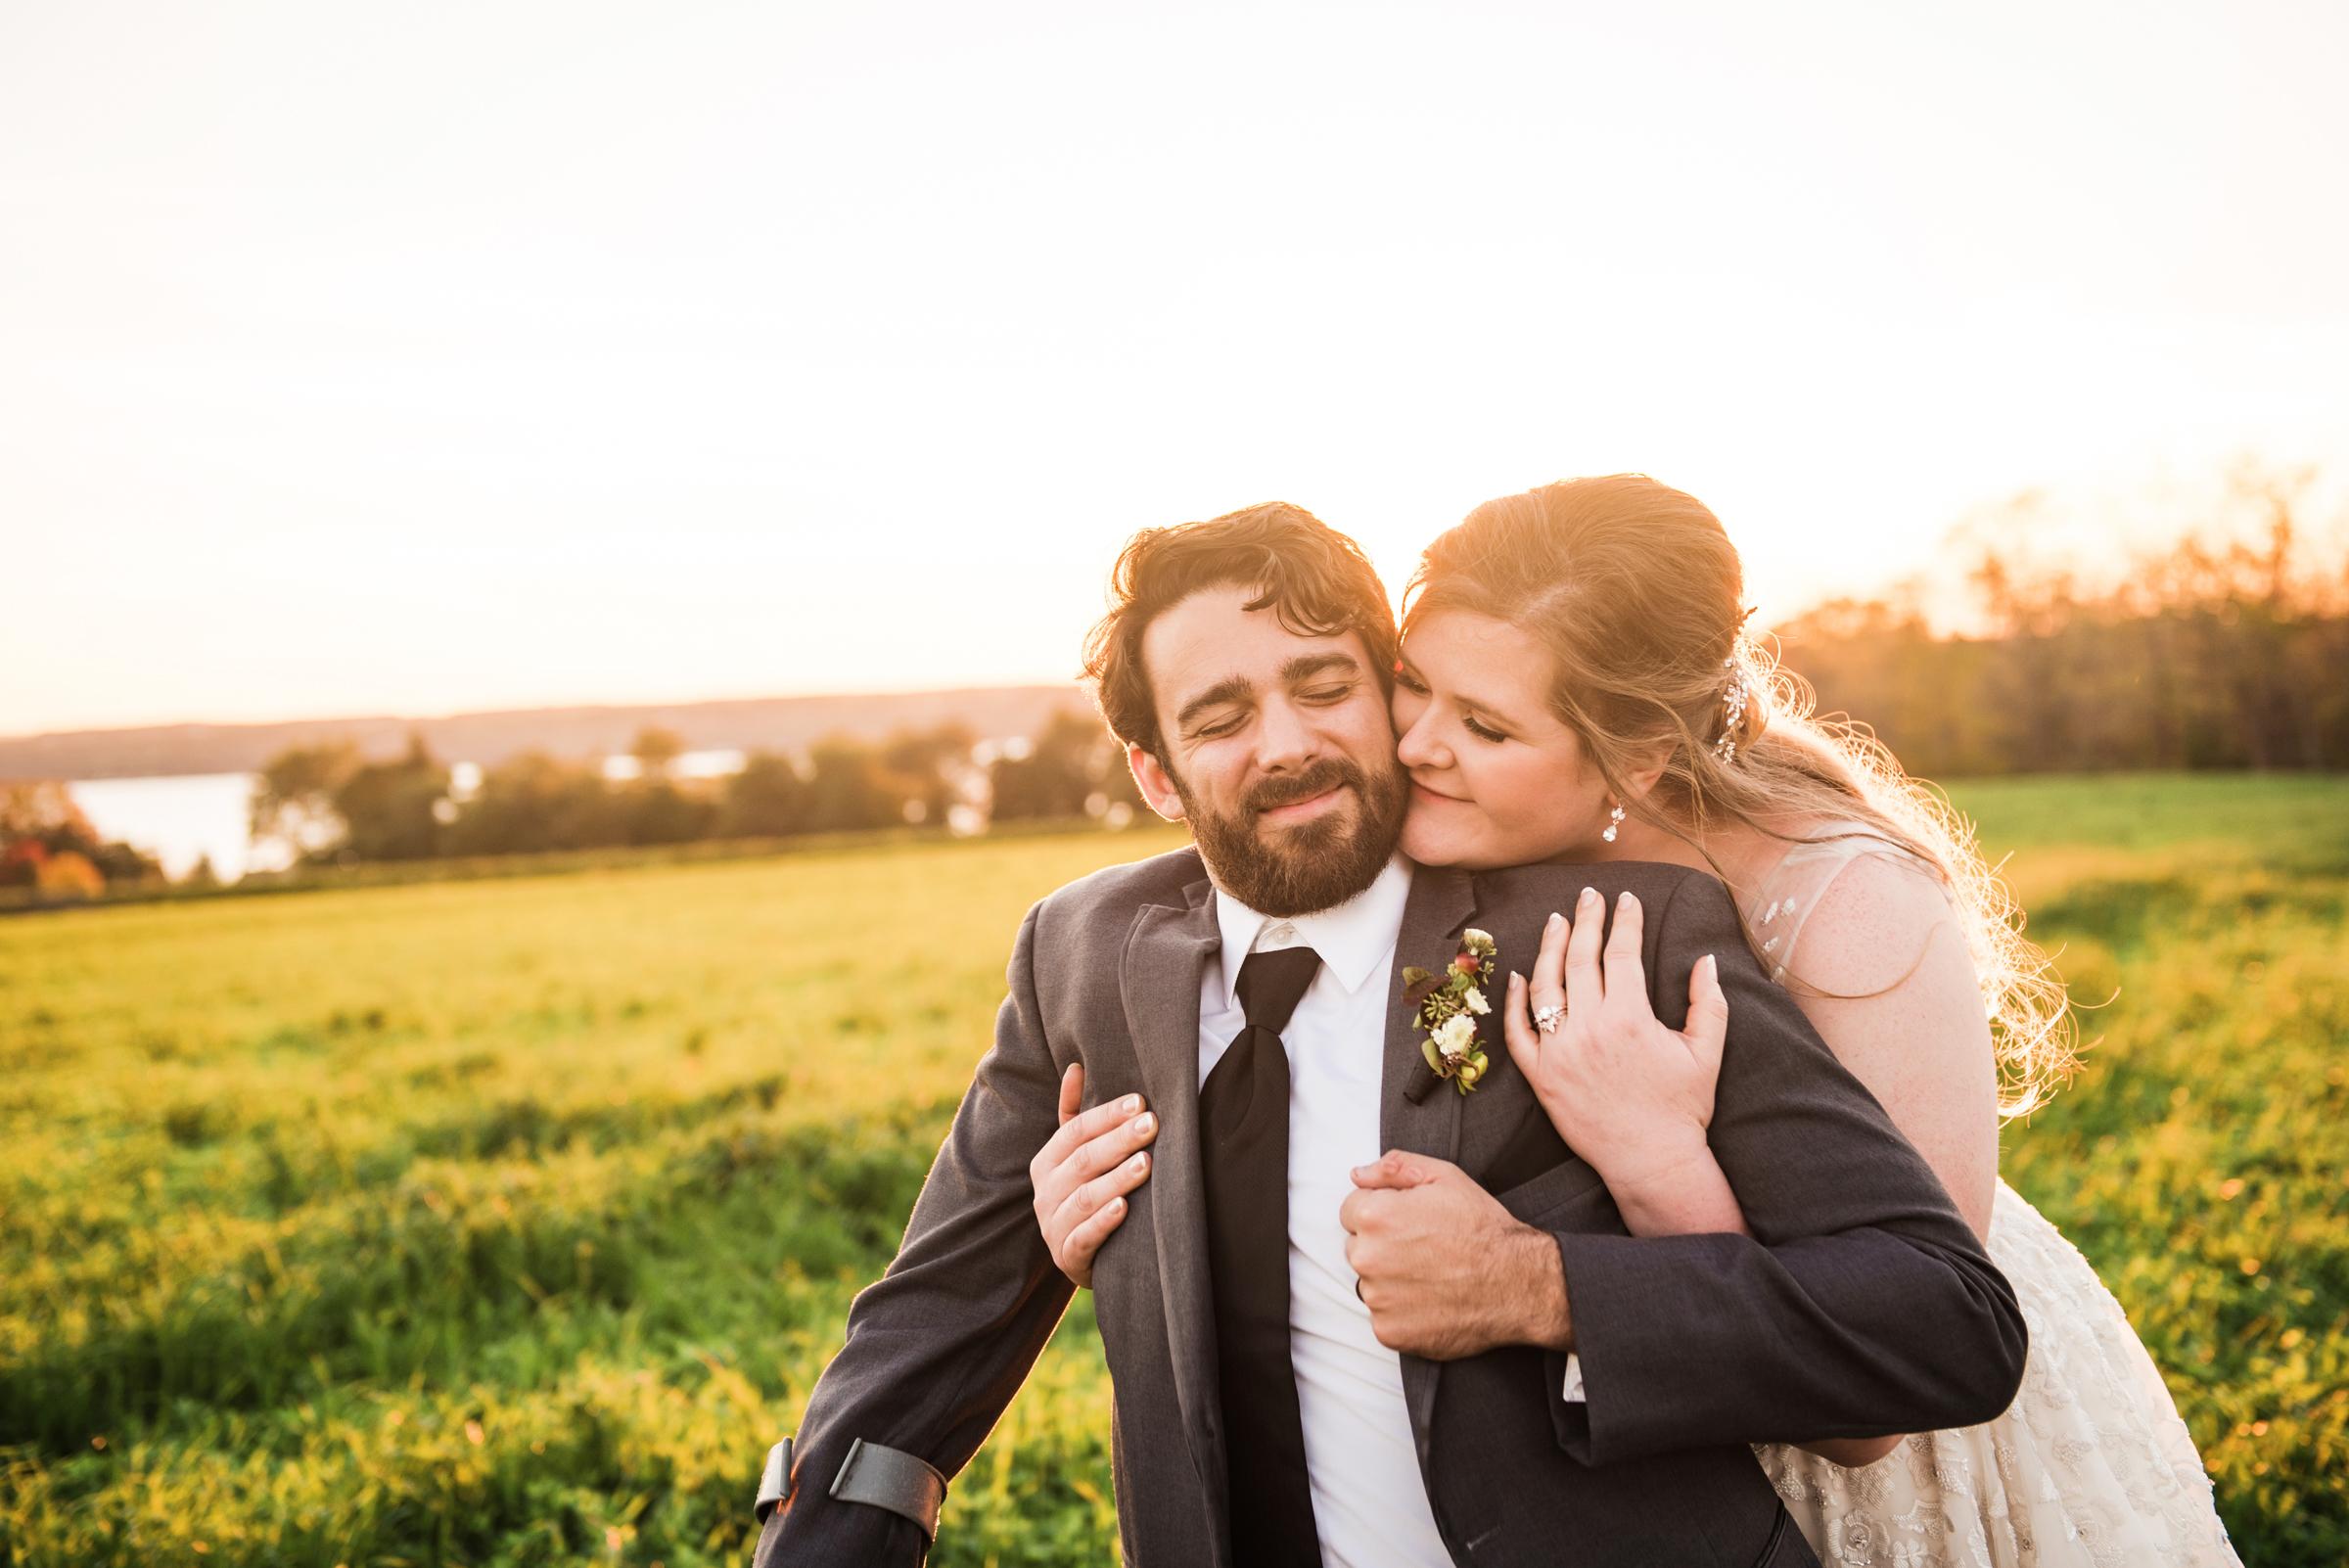 Zugibe_Vineyards_Finger_Lakes_Wedding_JILL_STUDIO_Rochester_NY_Photographer_DSC_4190.jpg